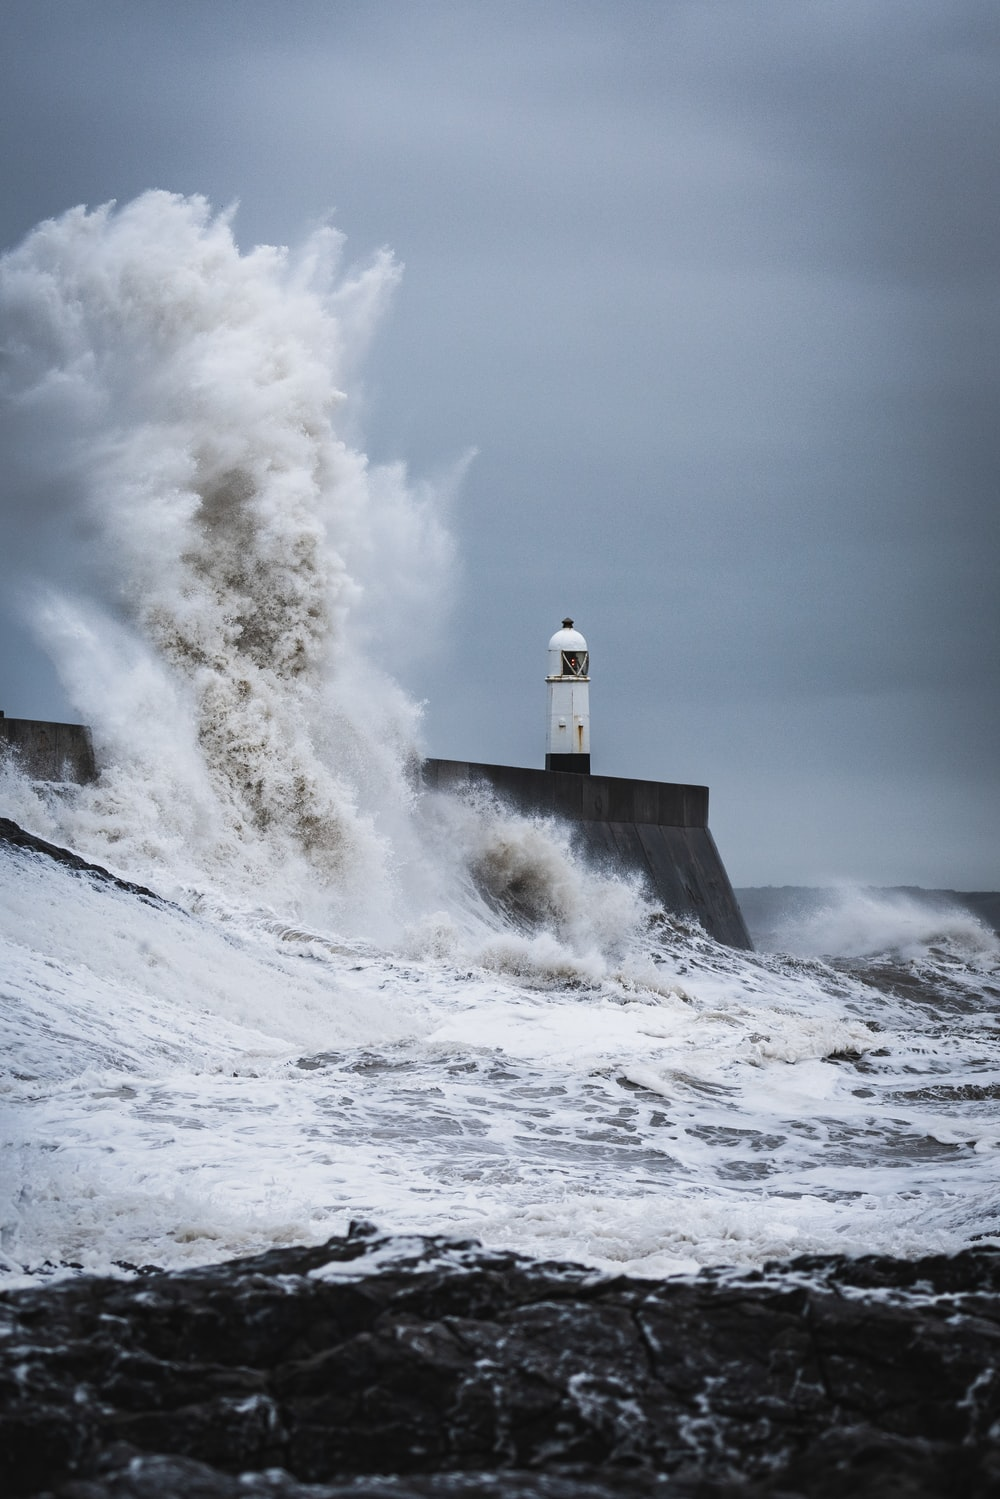 big waves crashing on lighthouse during daytime